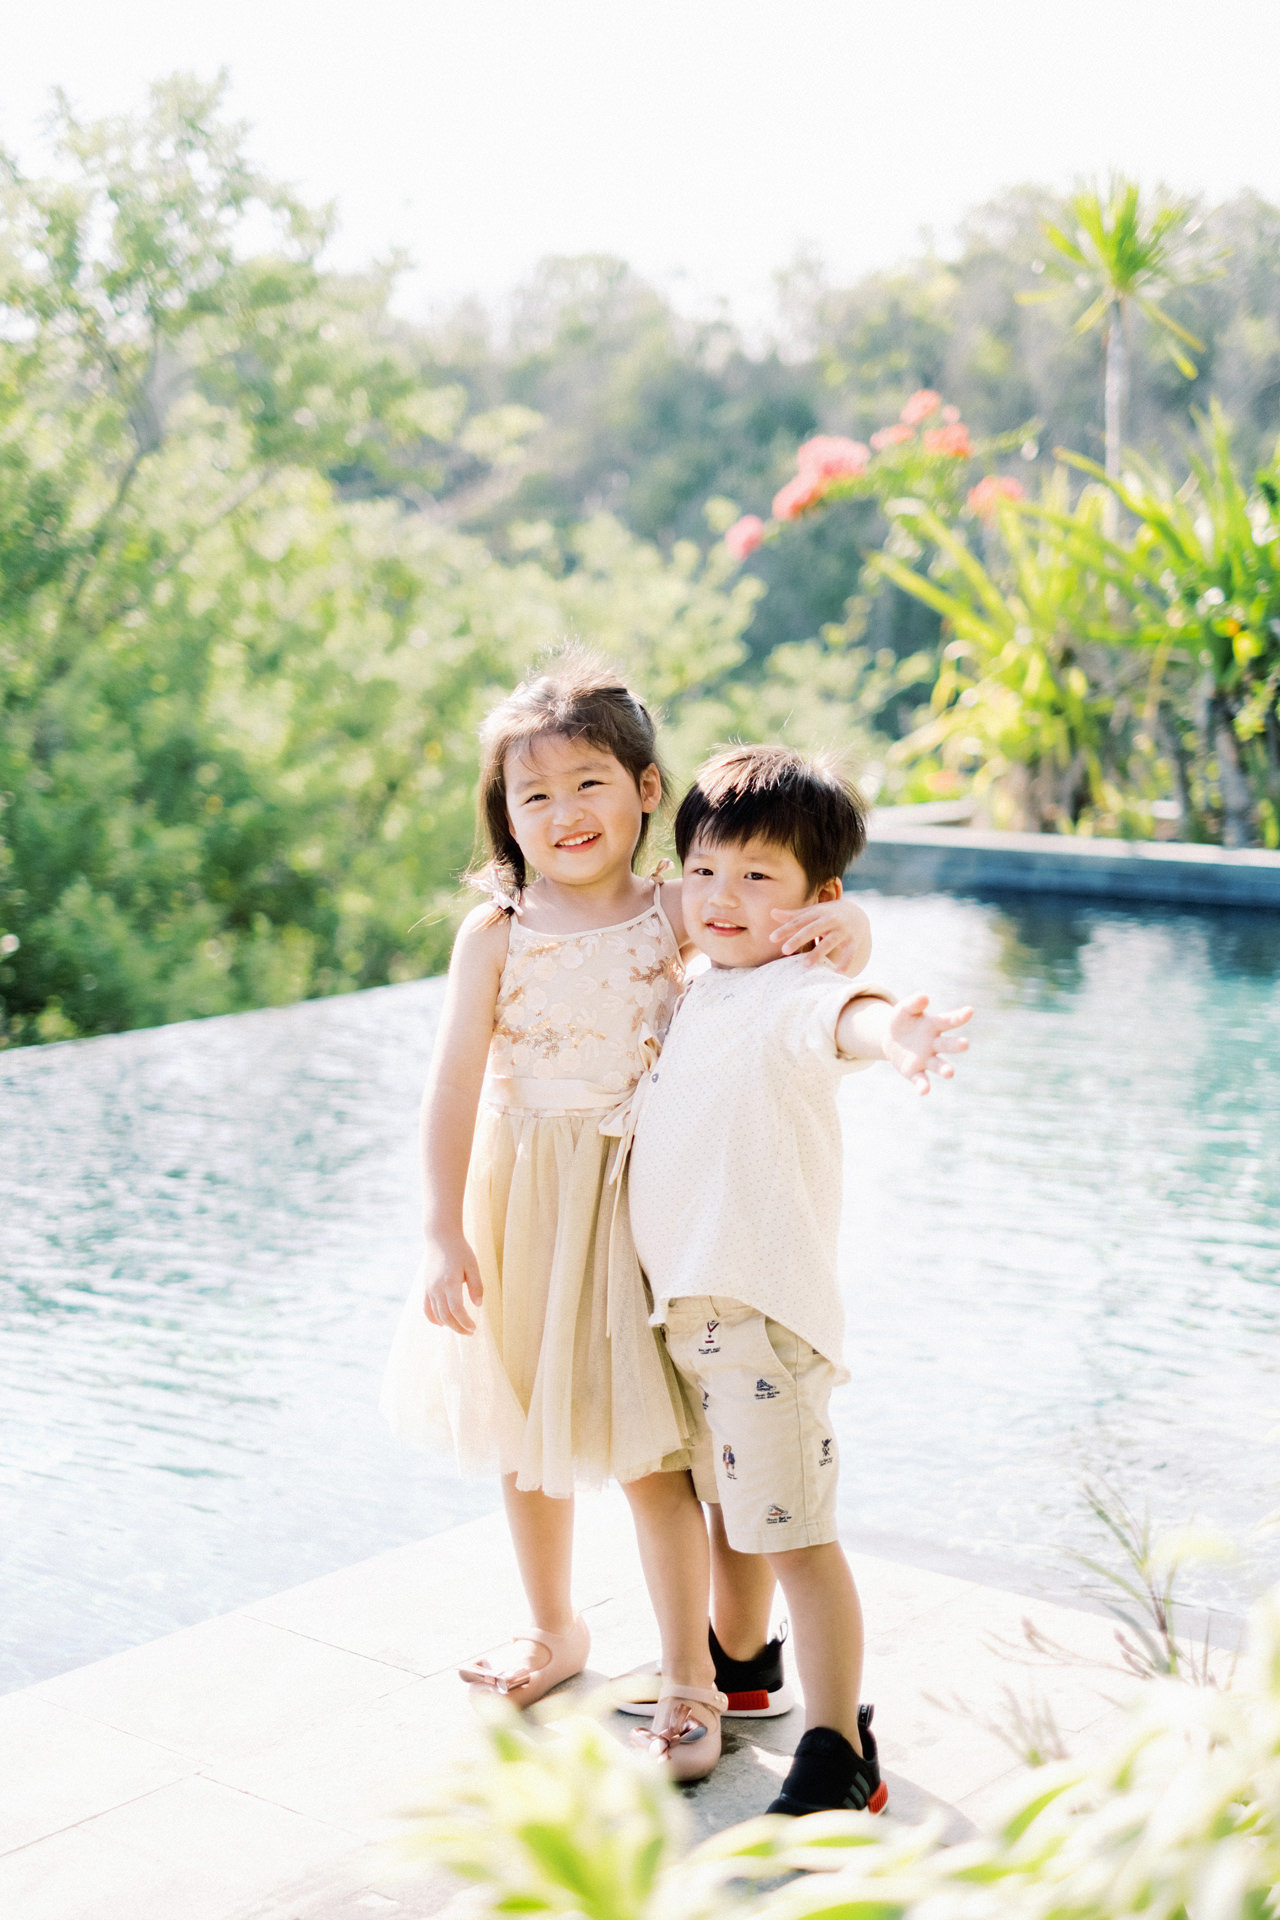 S&G: Bali Family Vacation Photo at The Beach 8